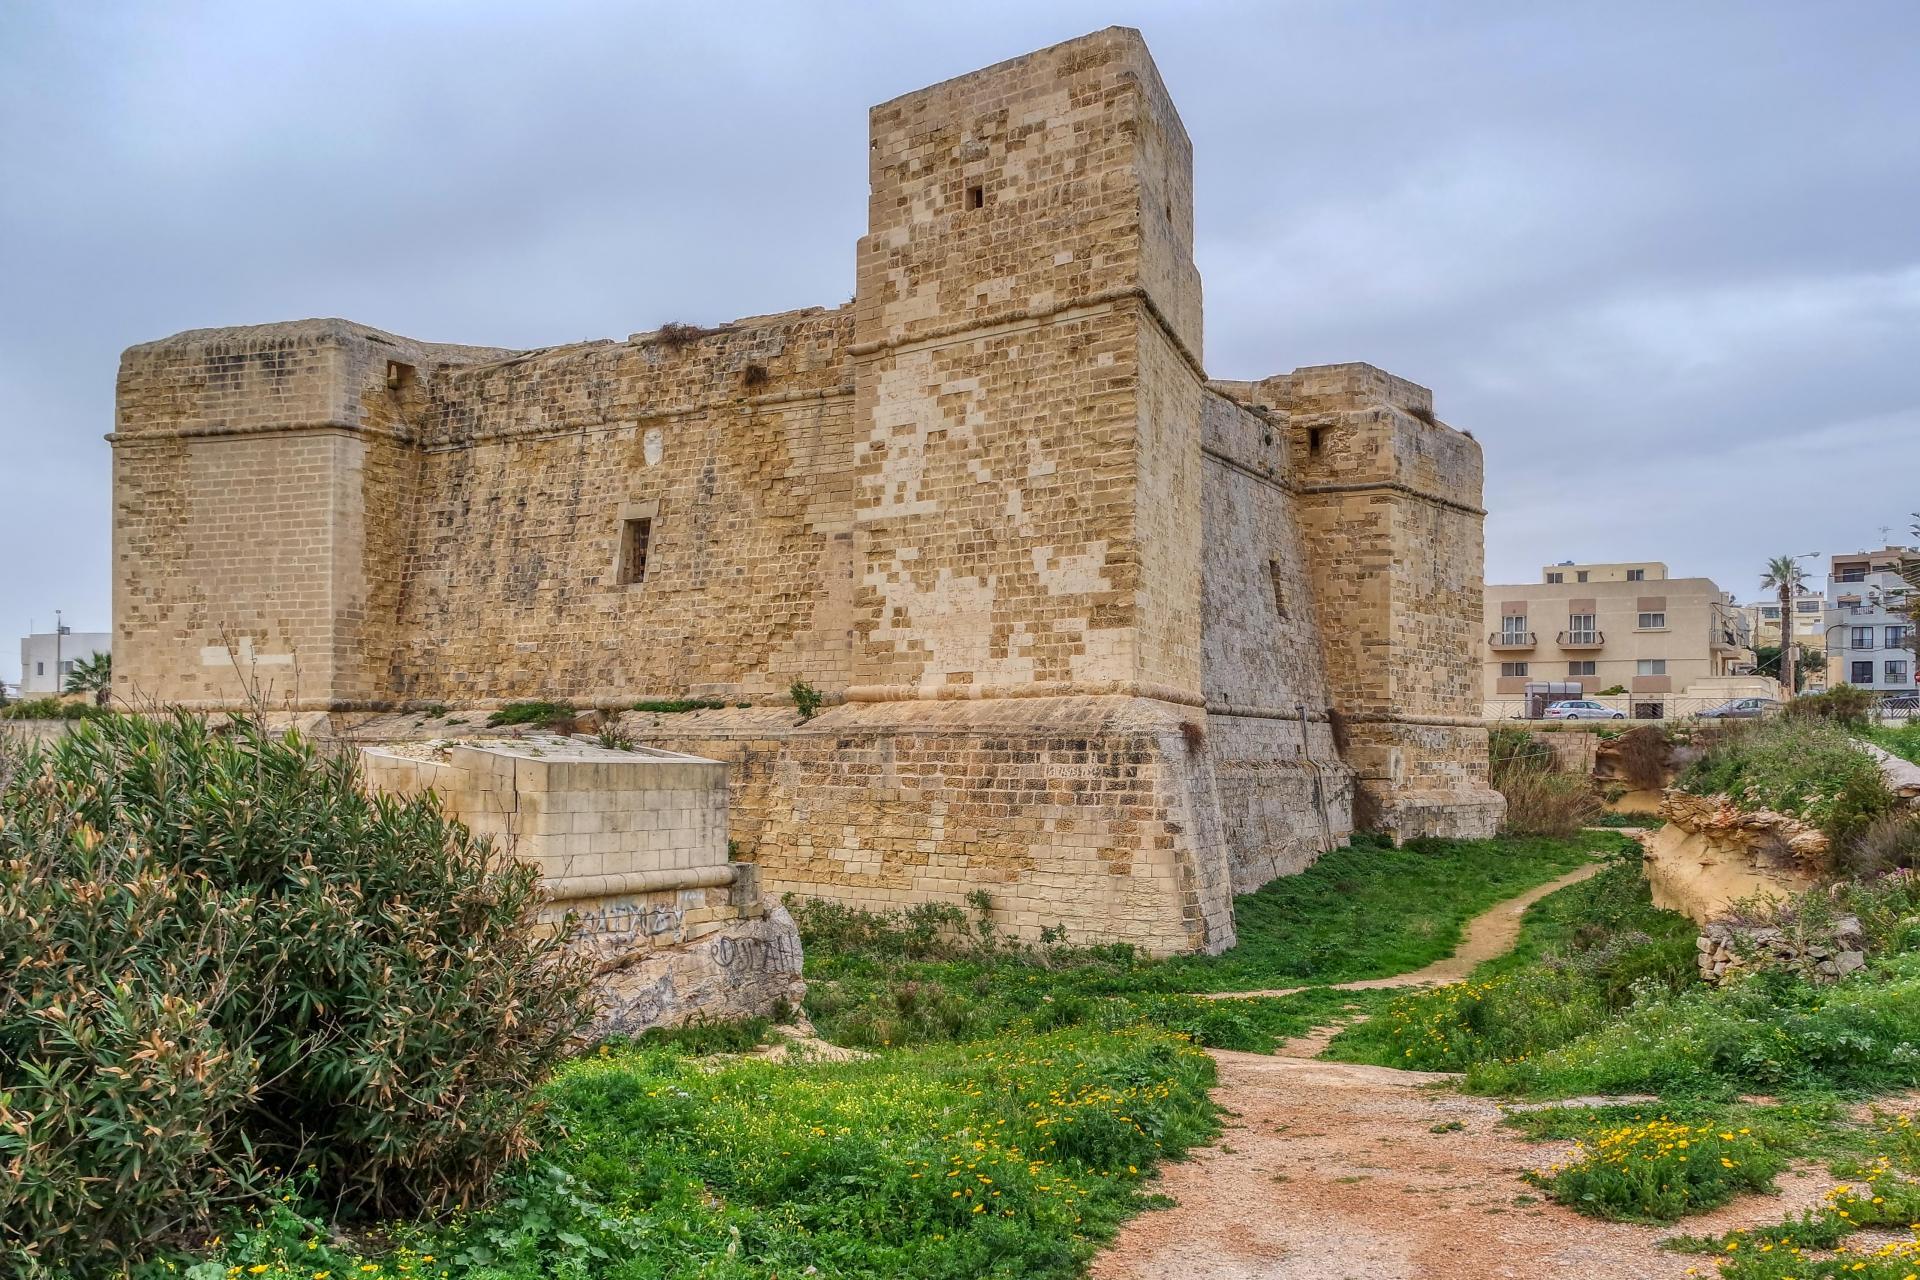 St Thomas tower in Marsascala. Photo: Shutterstock